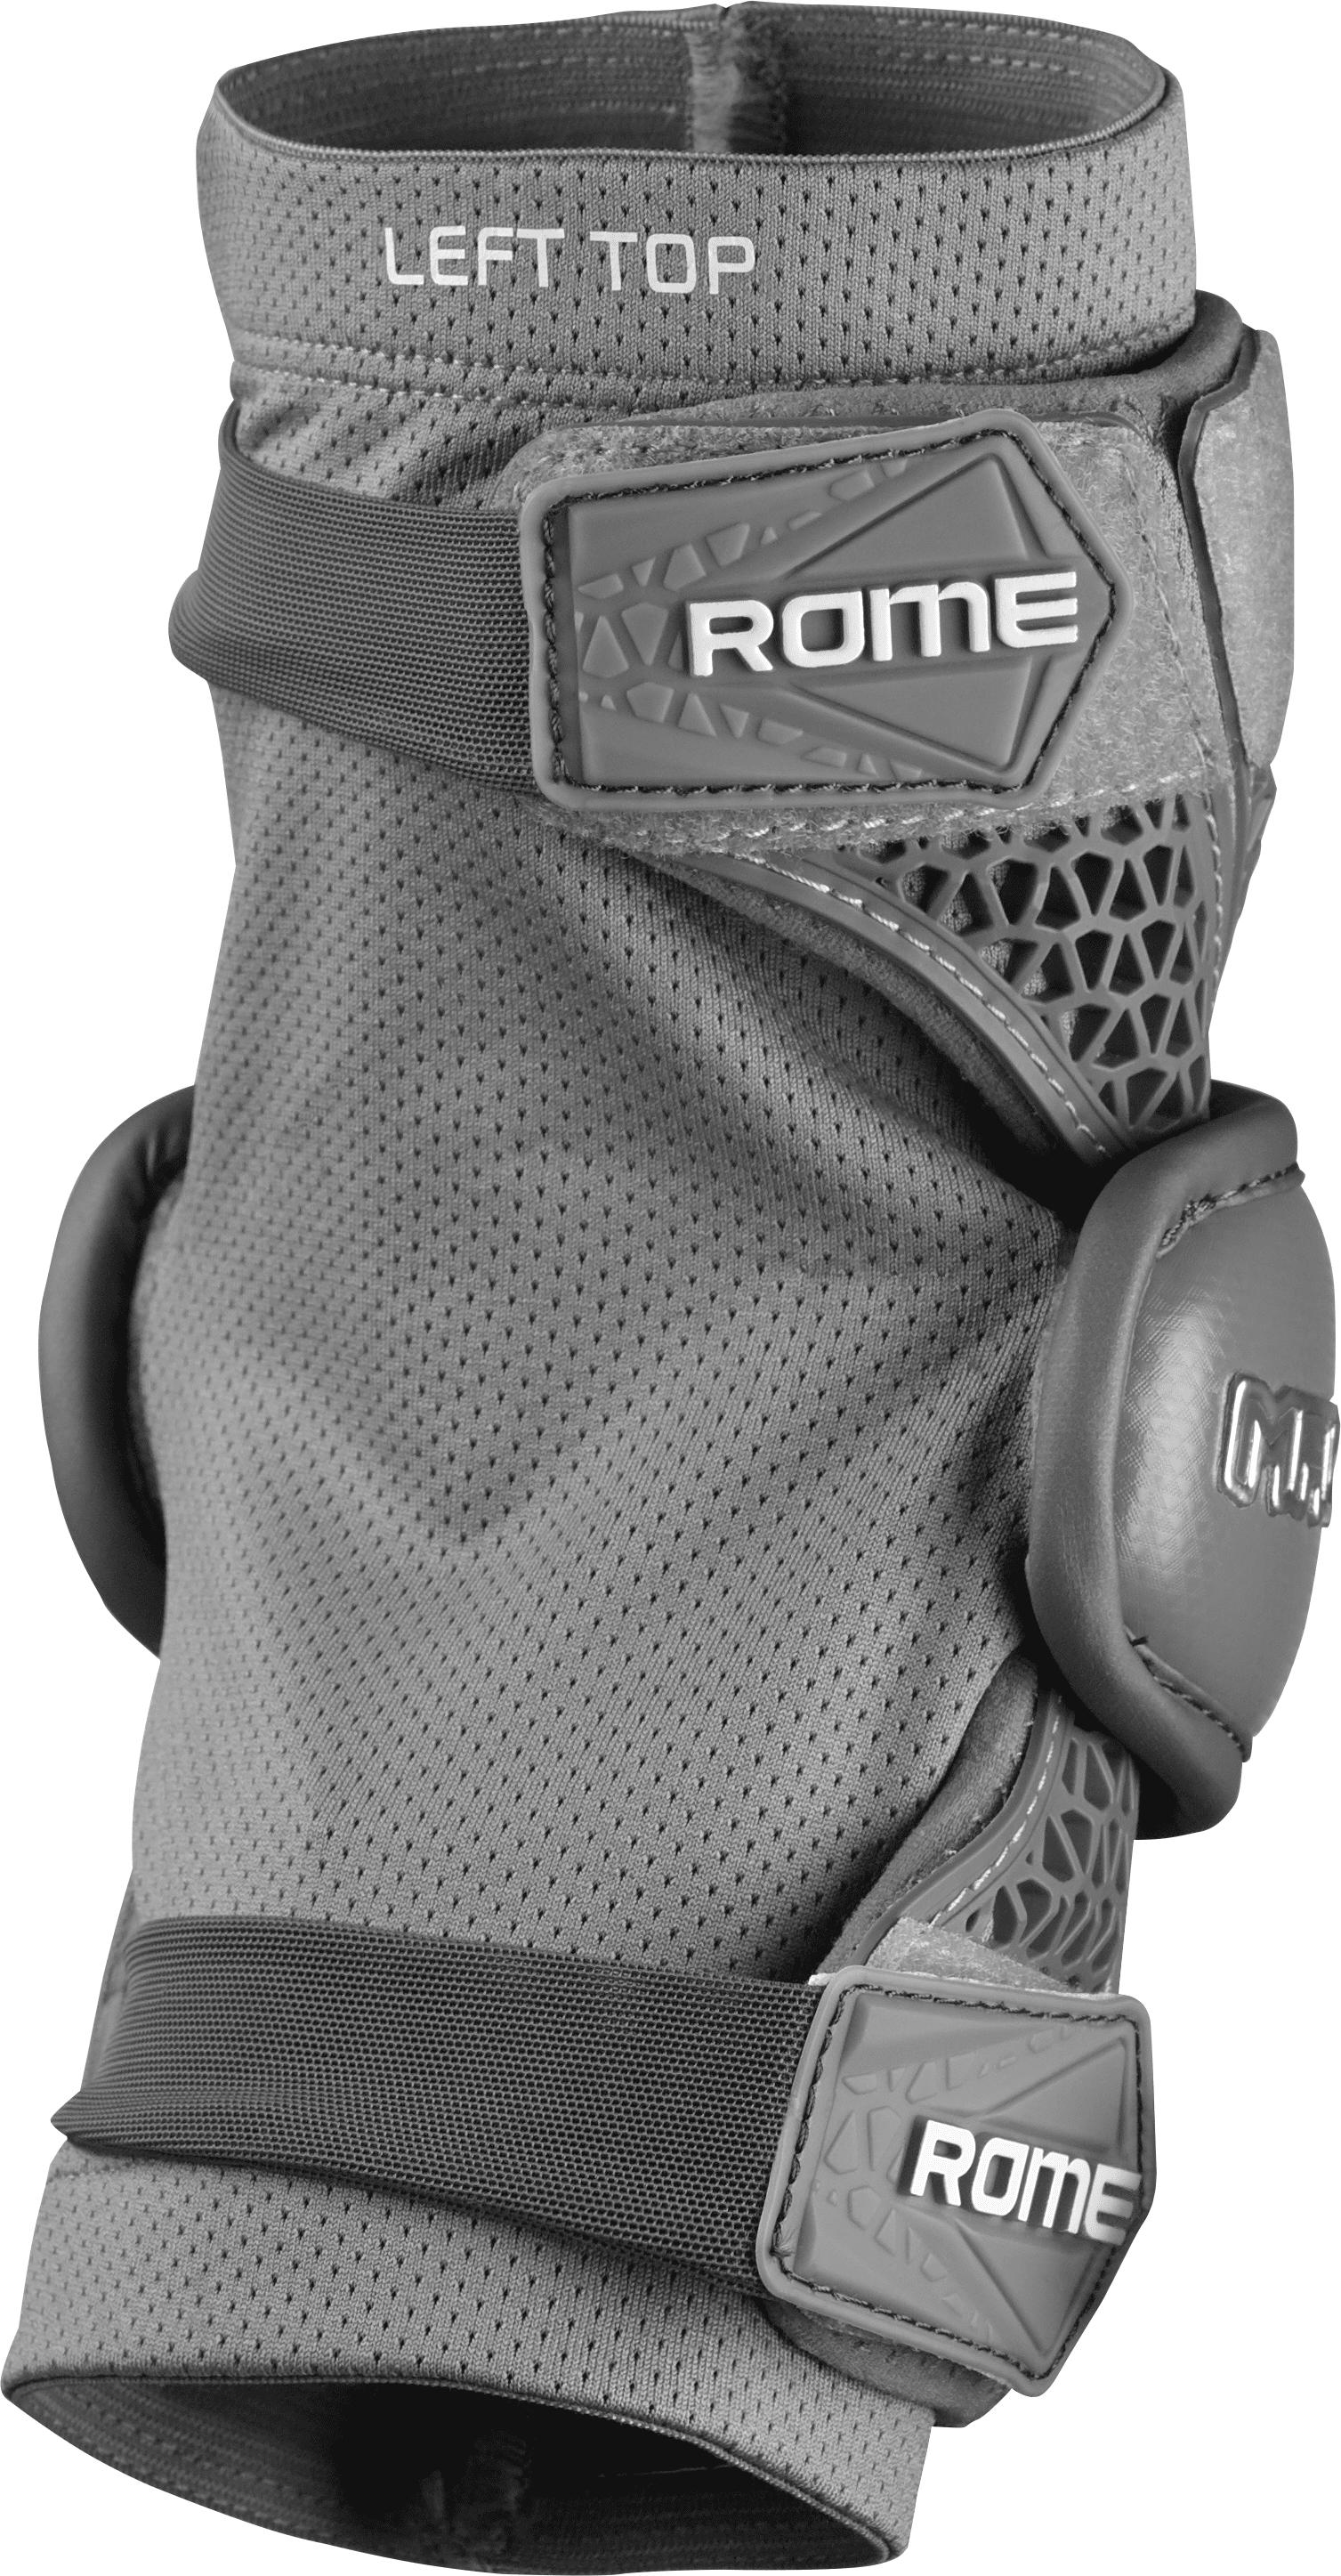 ROME_ARM-PAD_GREY_1-1.png